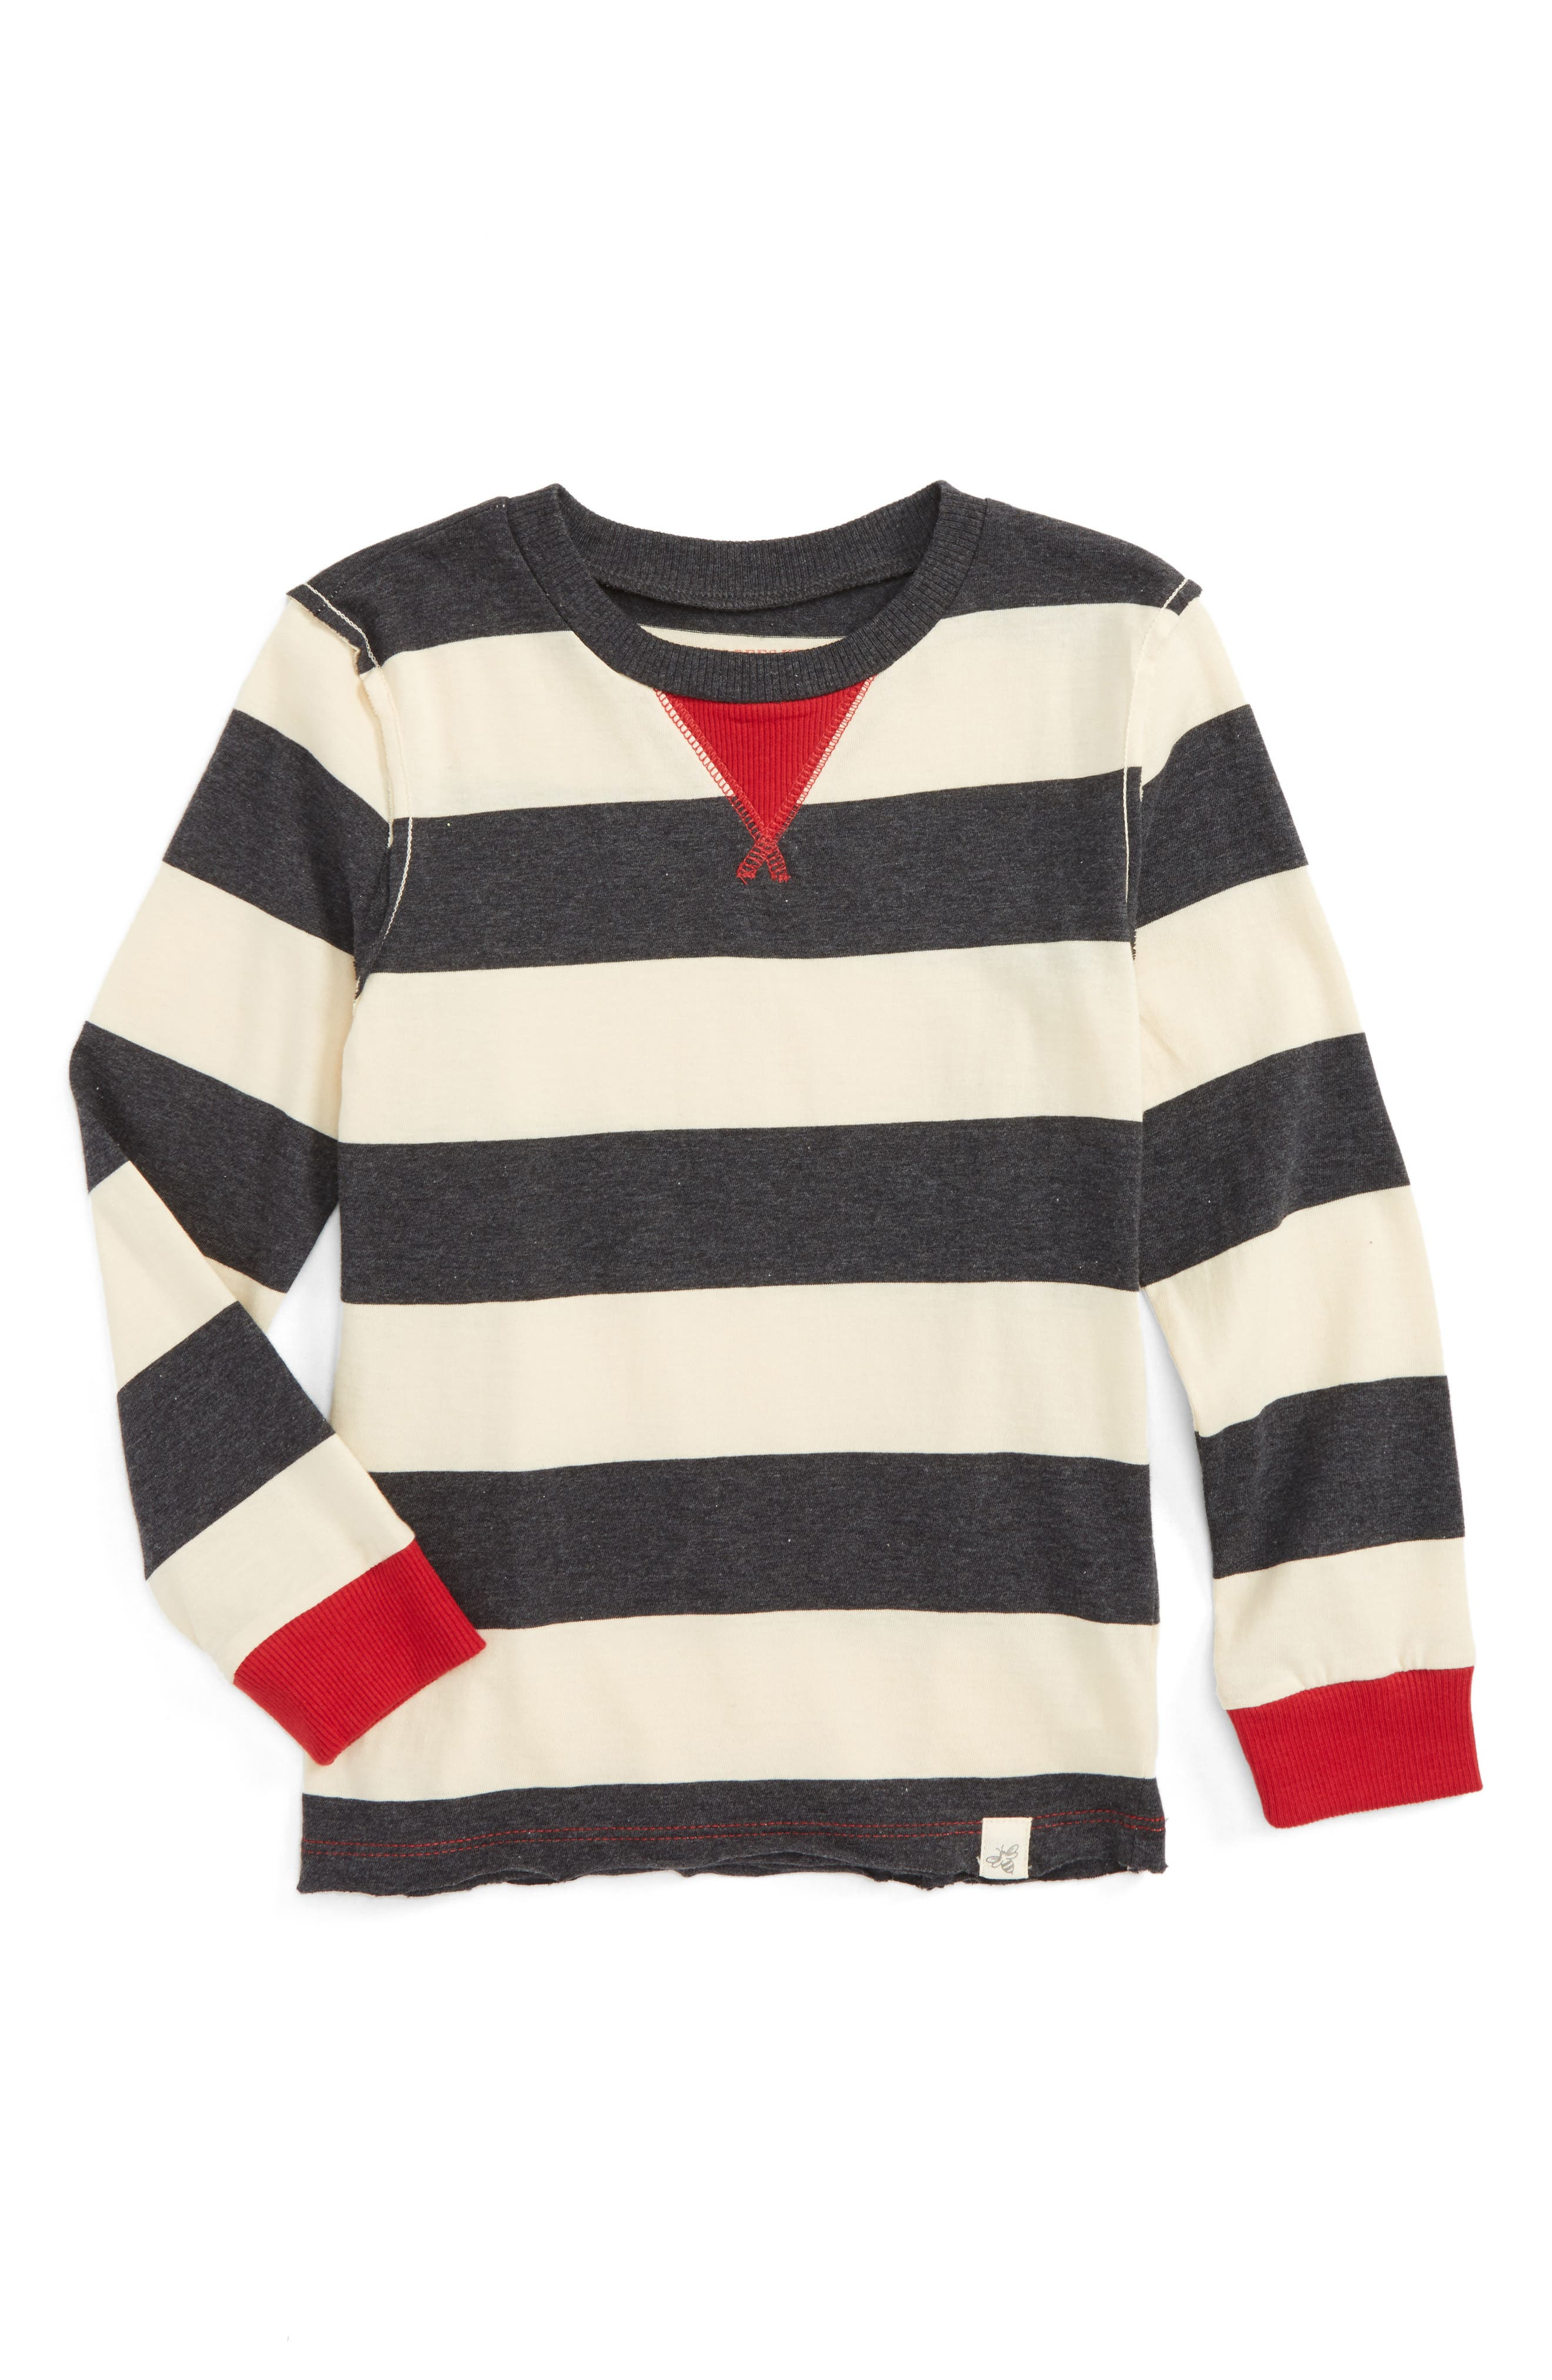 Burt's Bees Baby Stripe Long Sleeve T-Shirt (Toddler Boys & Little Boys)